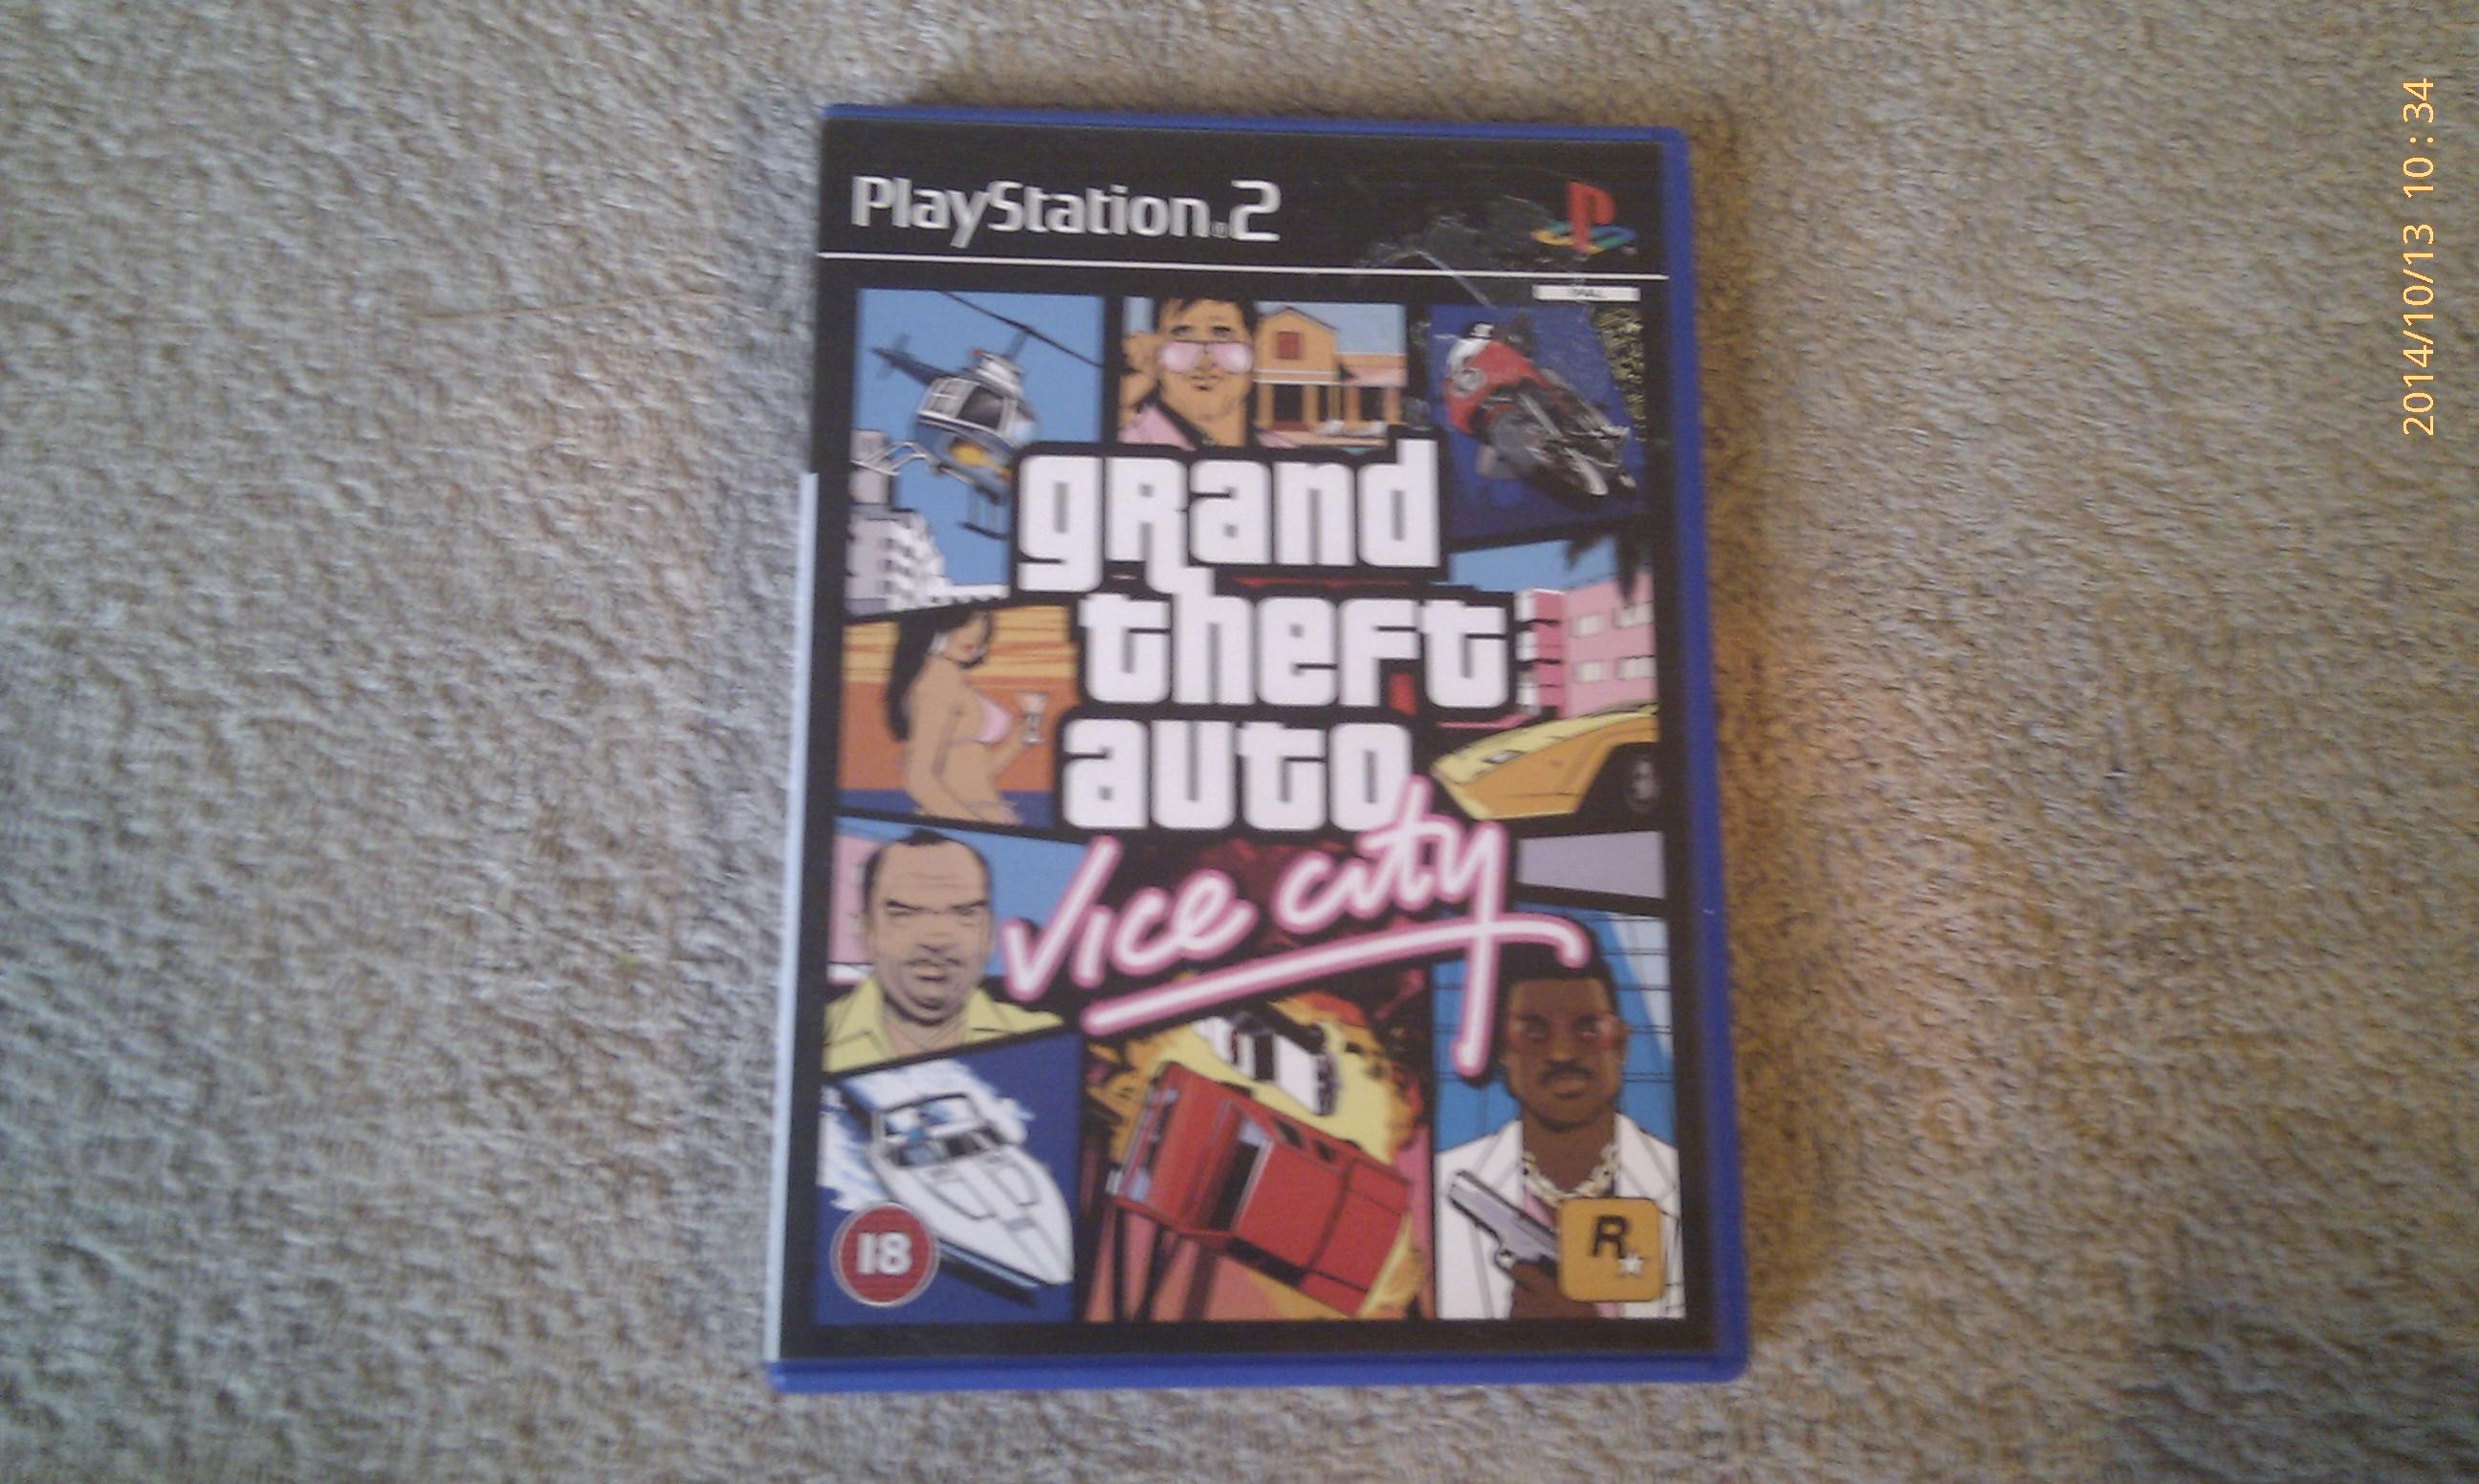 Grand Theft Auto GTA Vice City